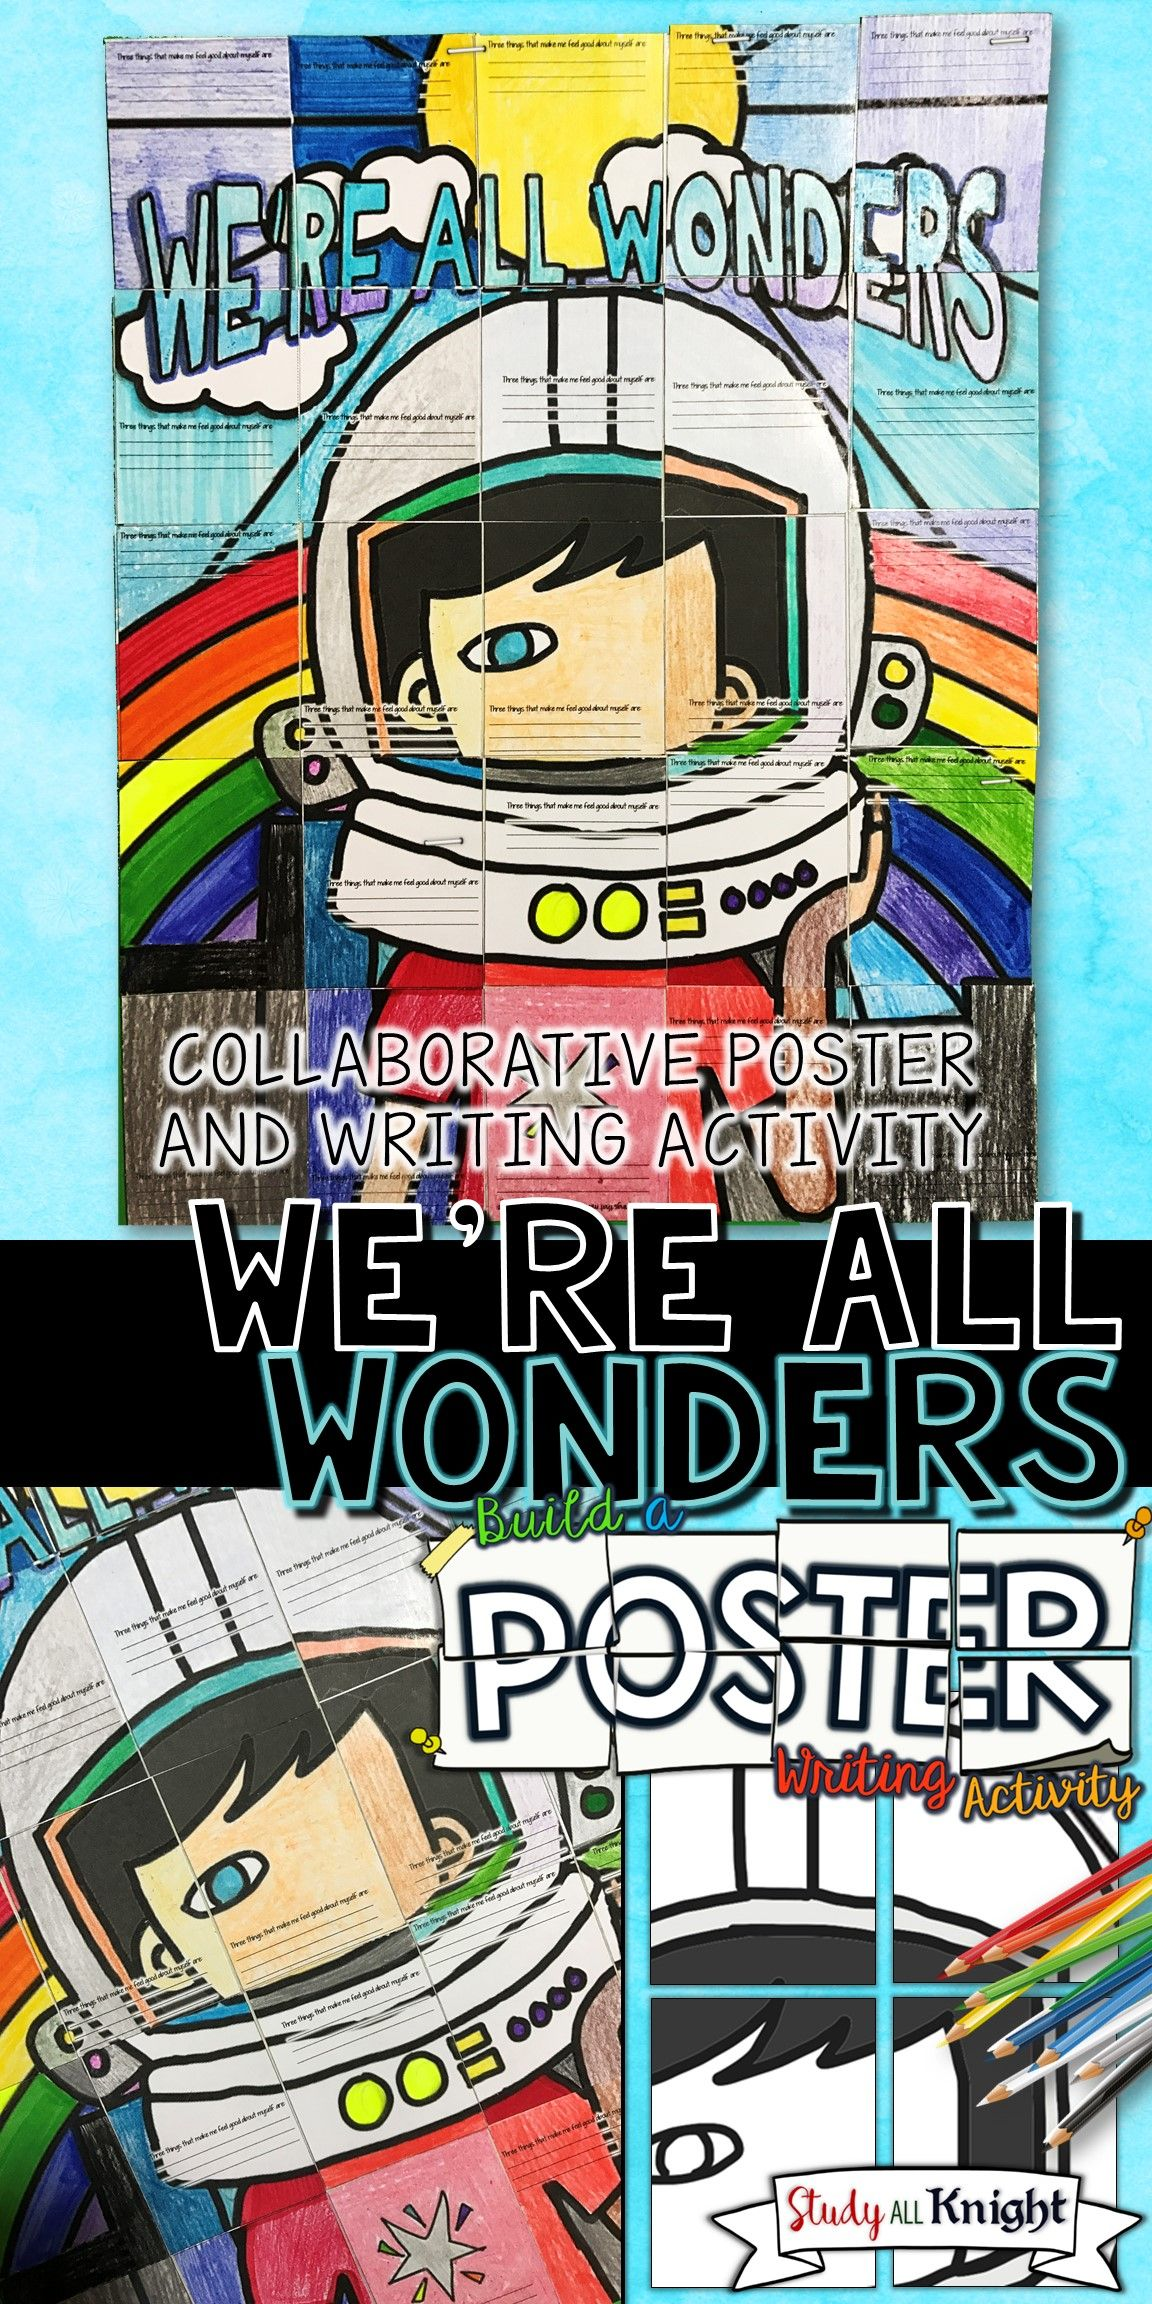 We Re All Wonders By R J Palacio Wonder Writing